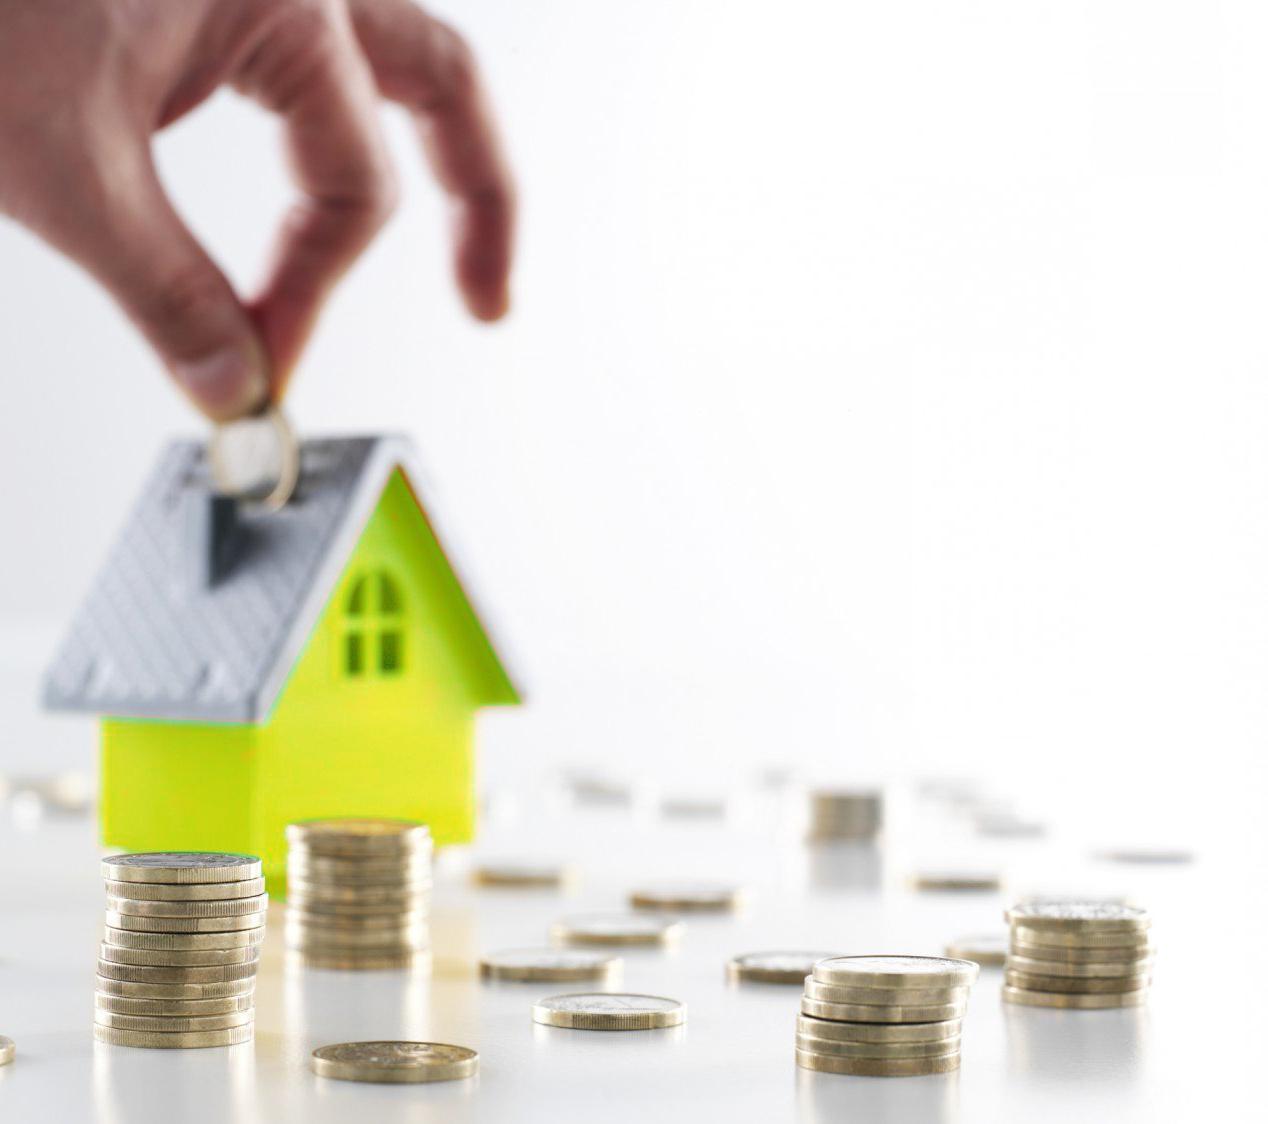 кпк залог недвижимости займ